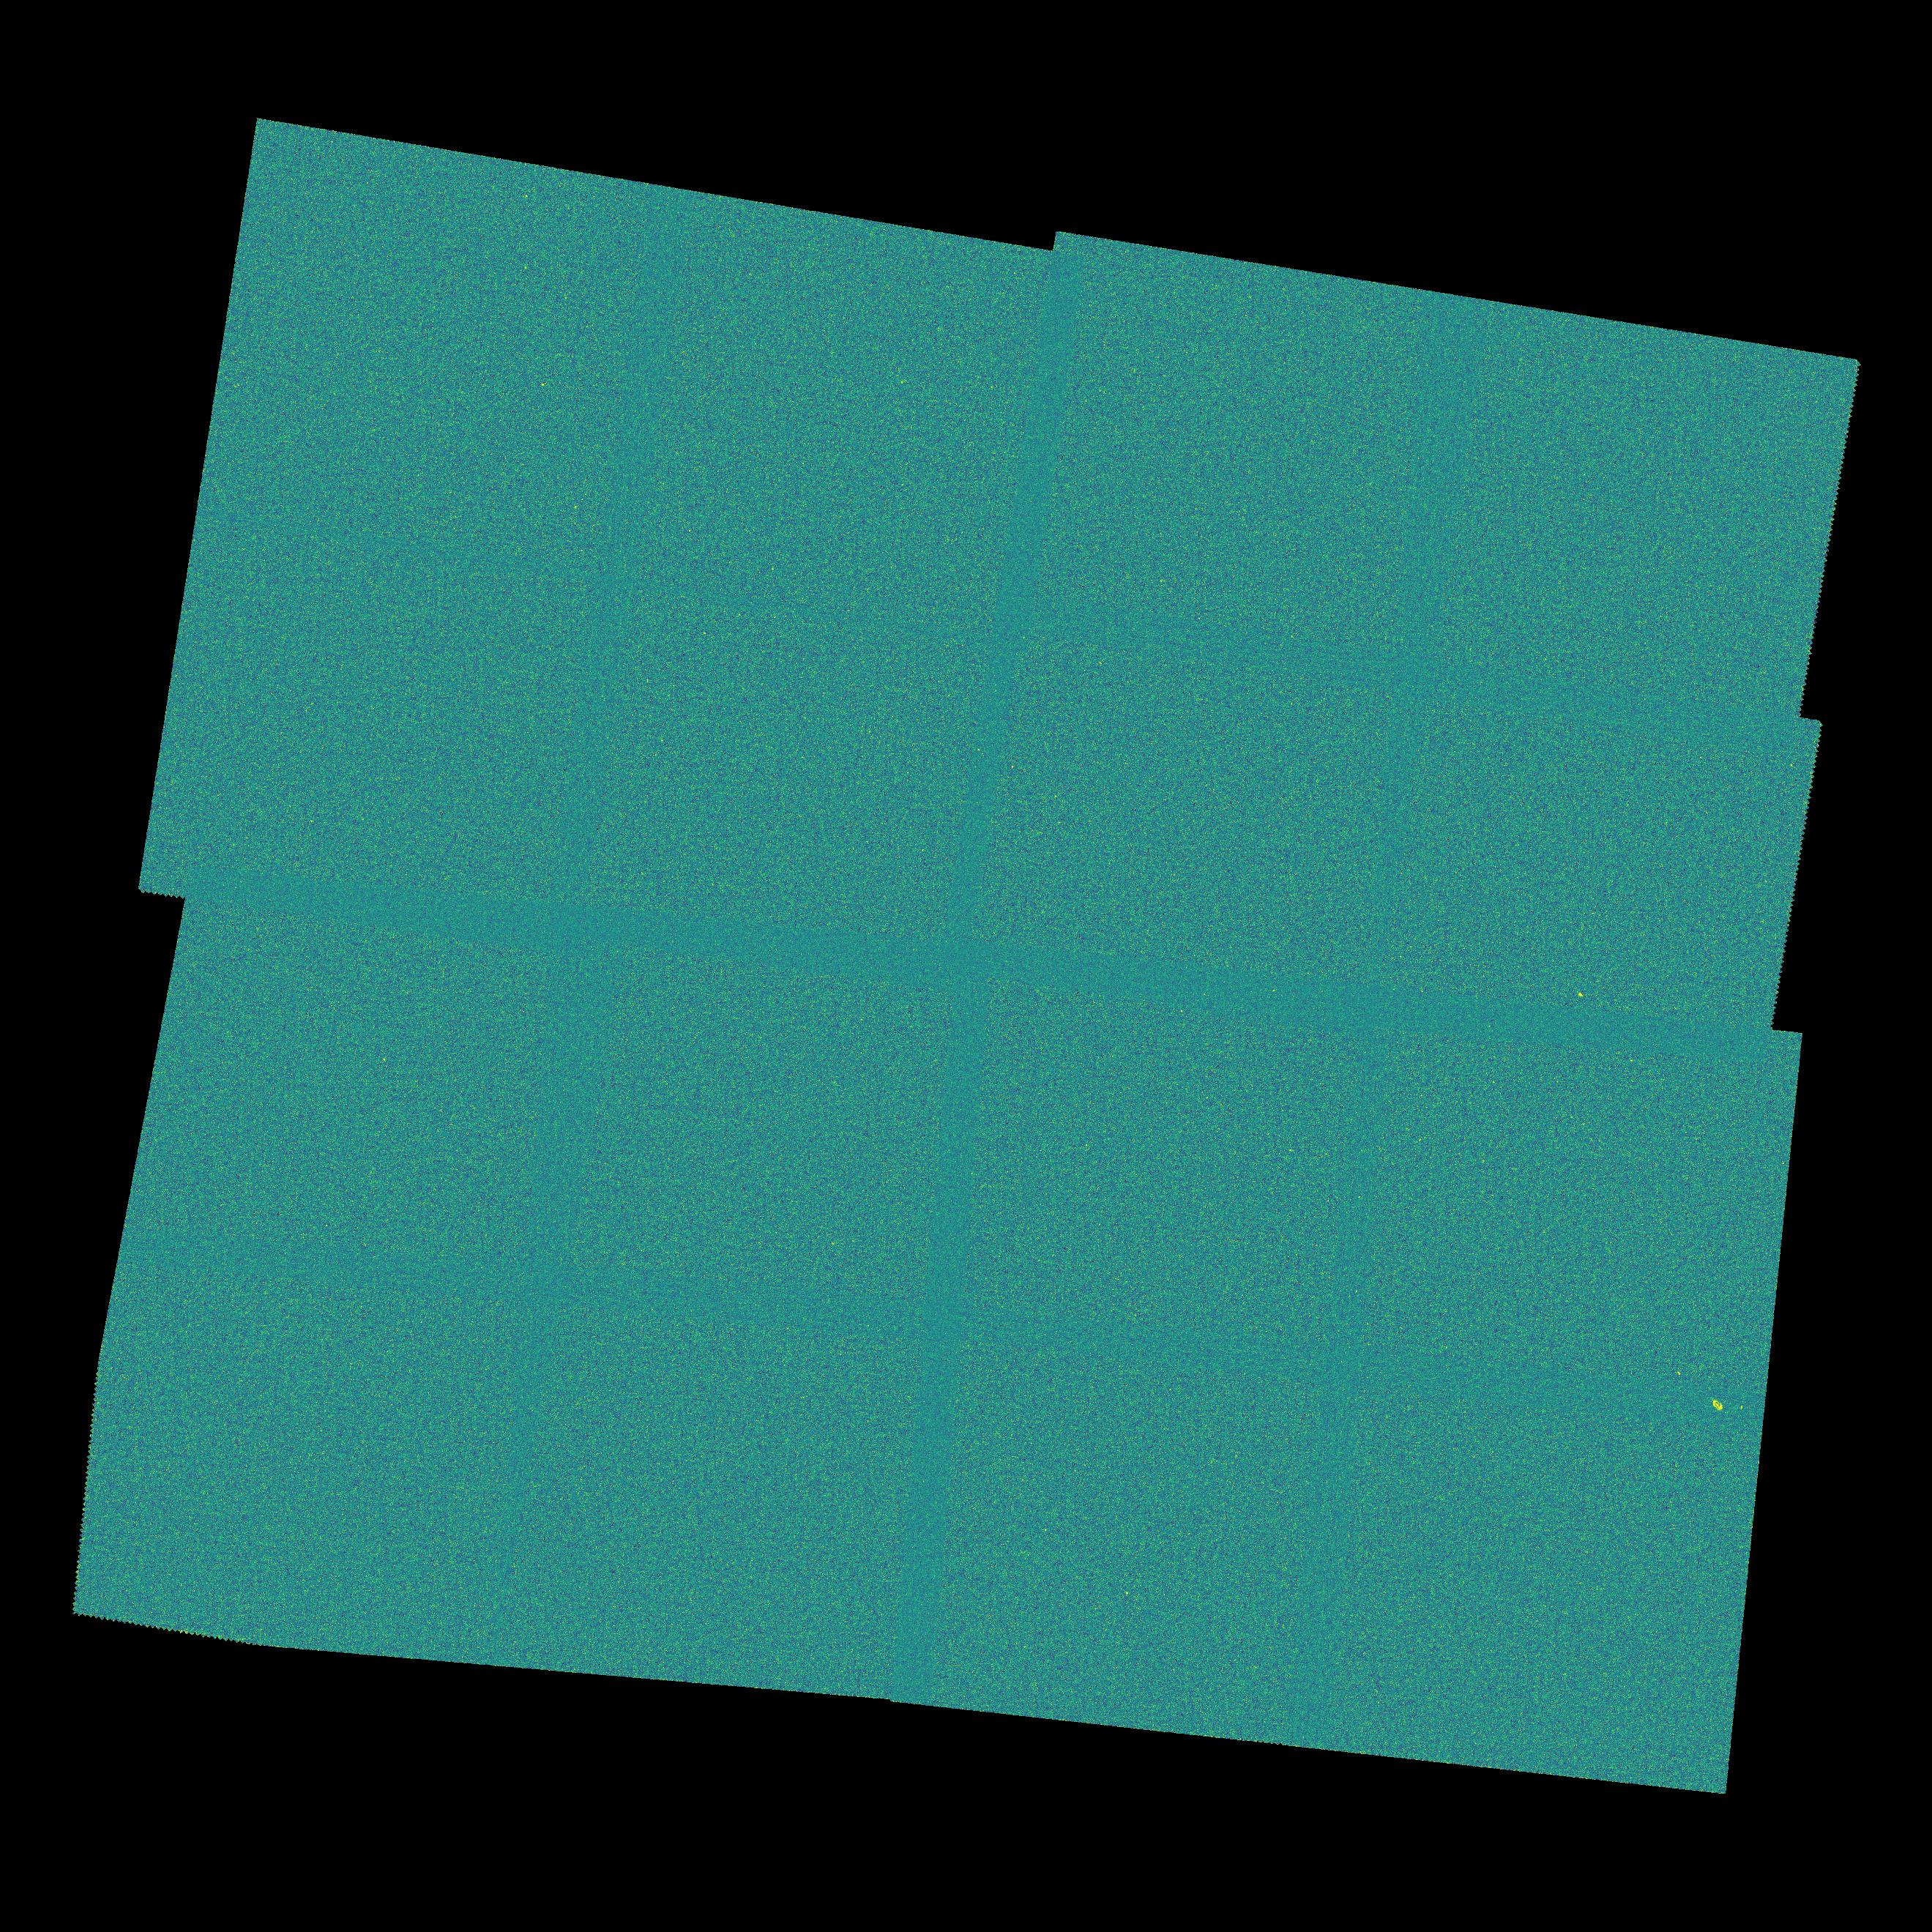 1567214300003-Herschel_PACS_North_Galactic_Pole.jpg